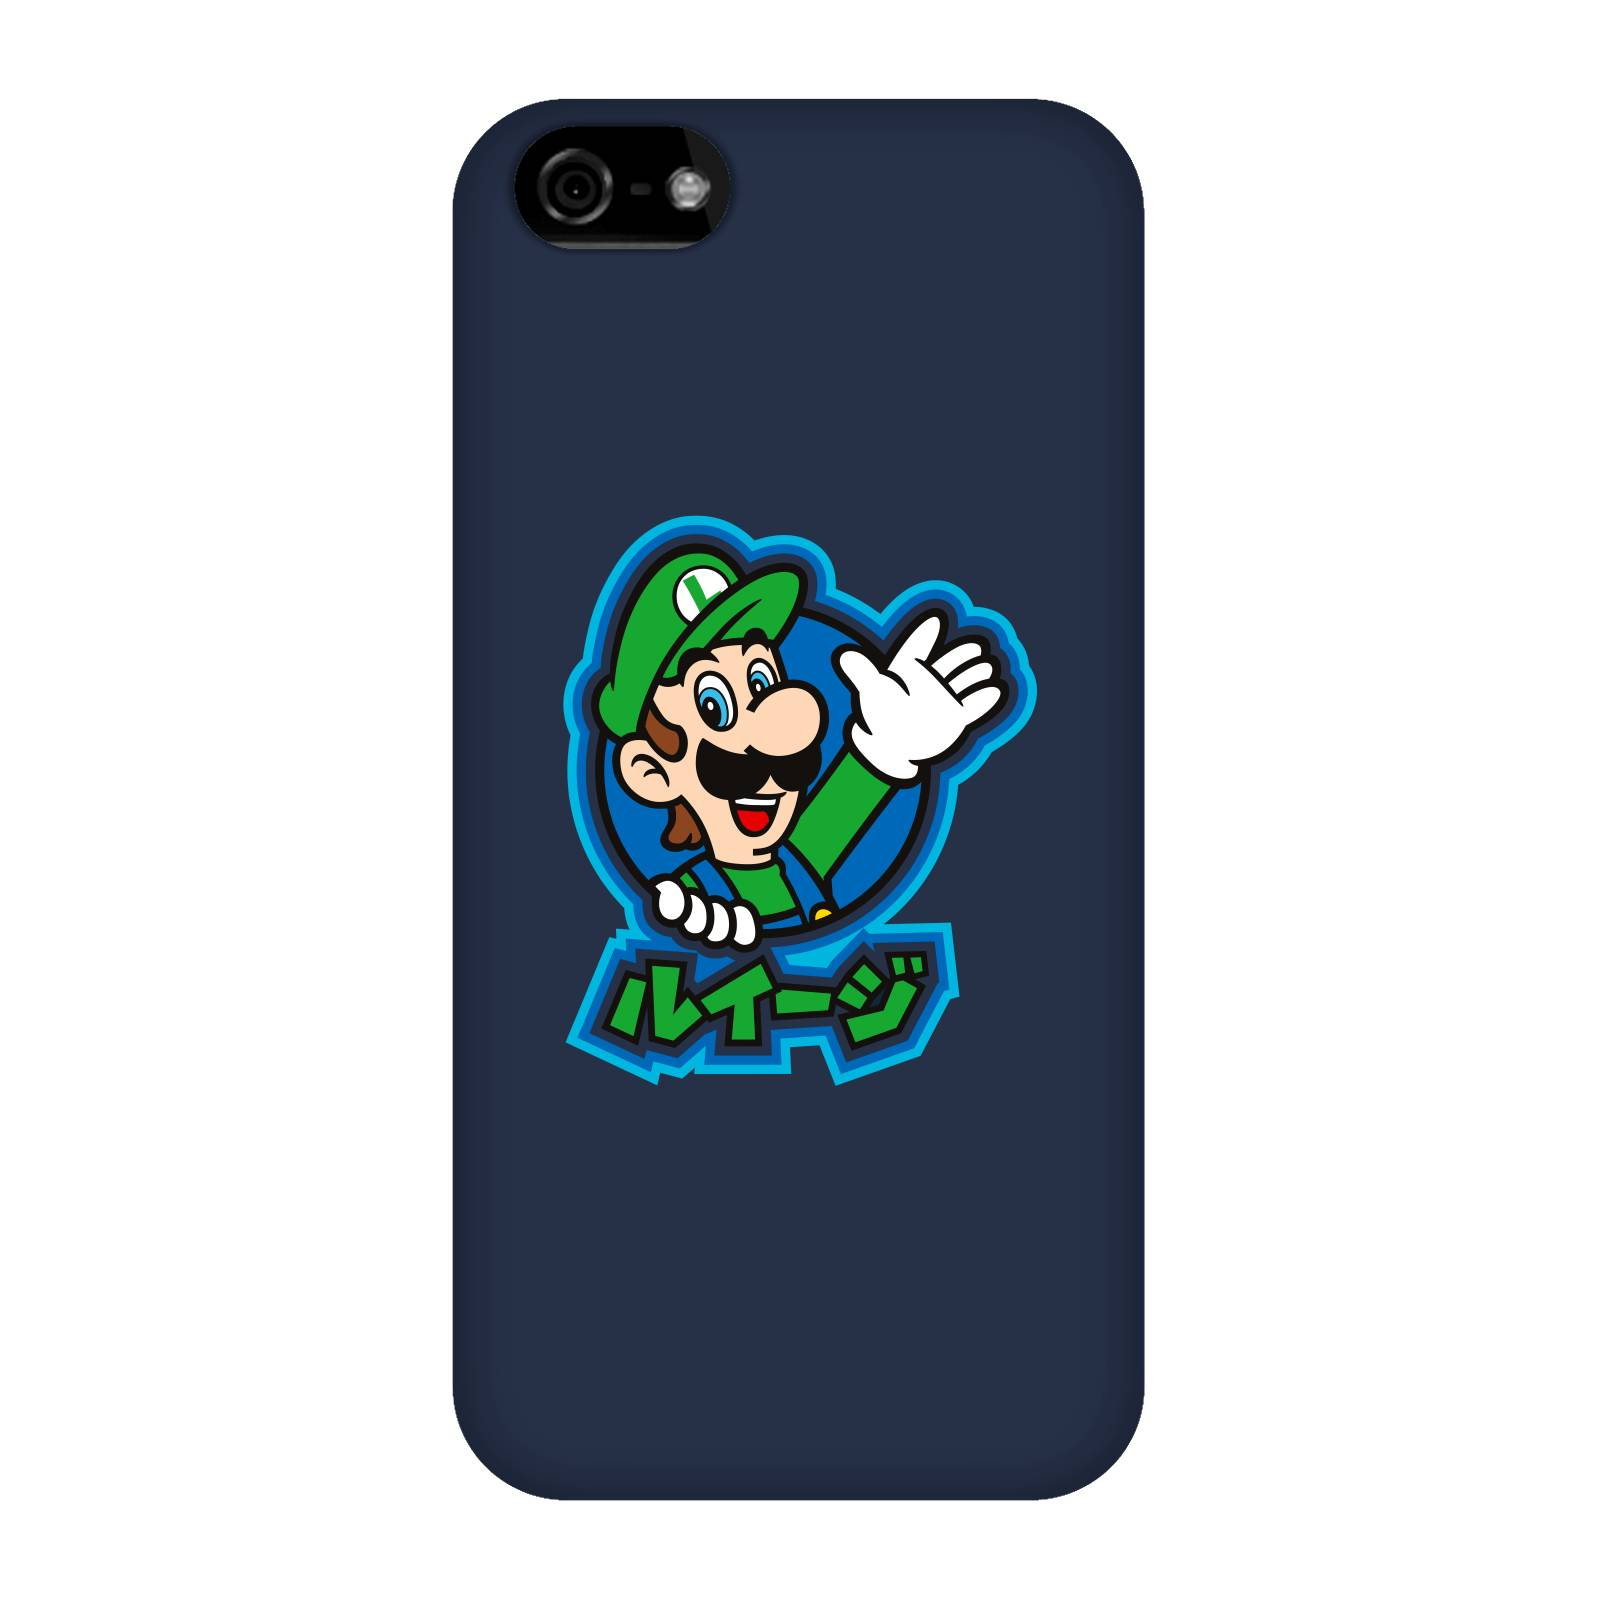 Nintendo Super Mario Luigi Kanji Phone Case - iPhone 5C - Snap Case - Gloss-